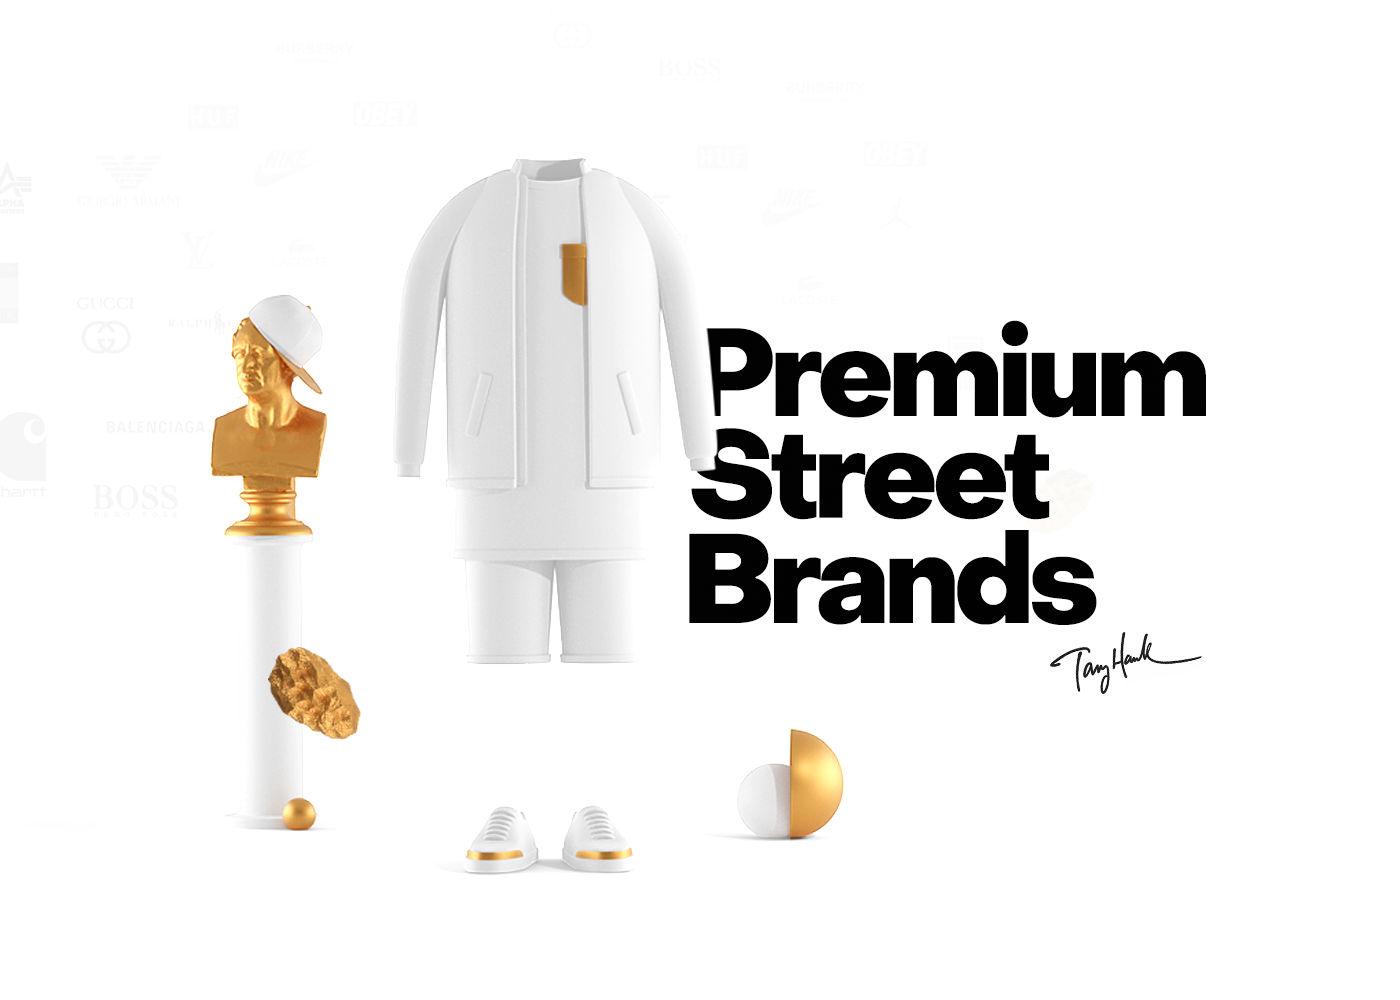 Premium Street Brands Store